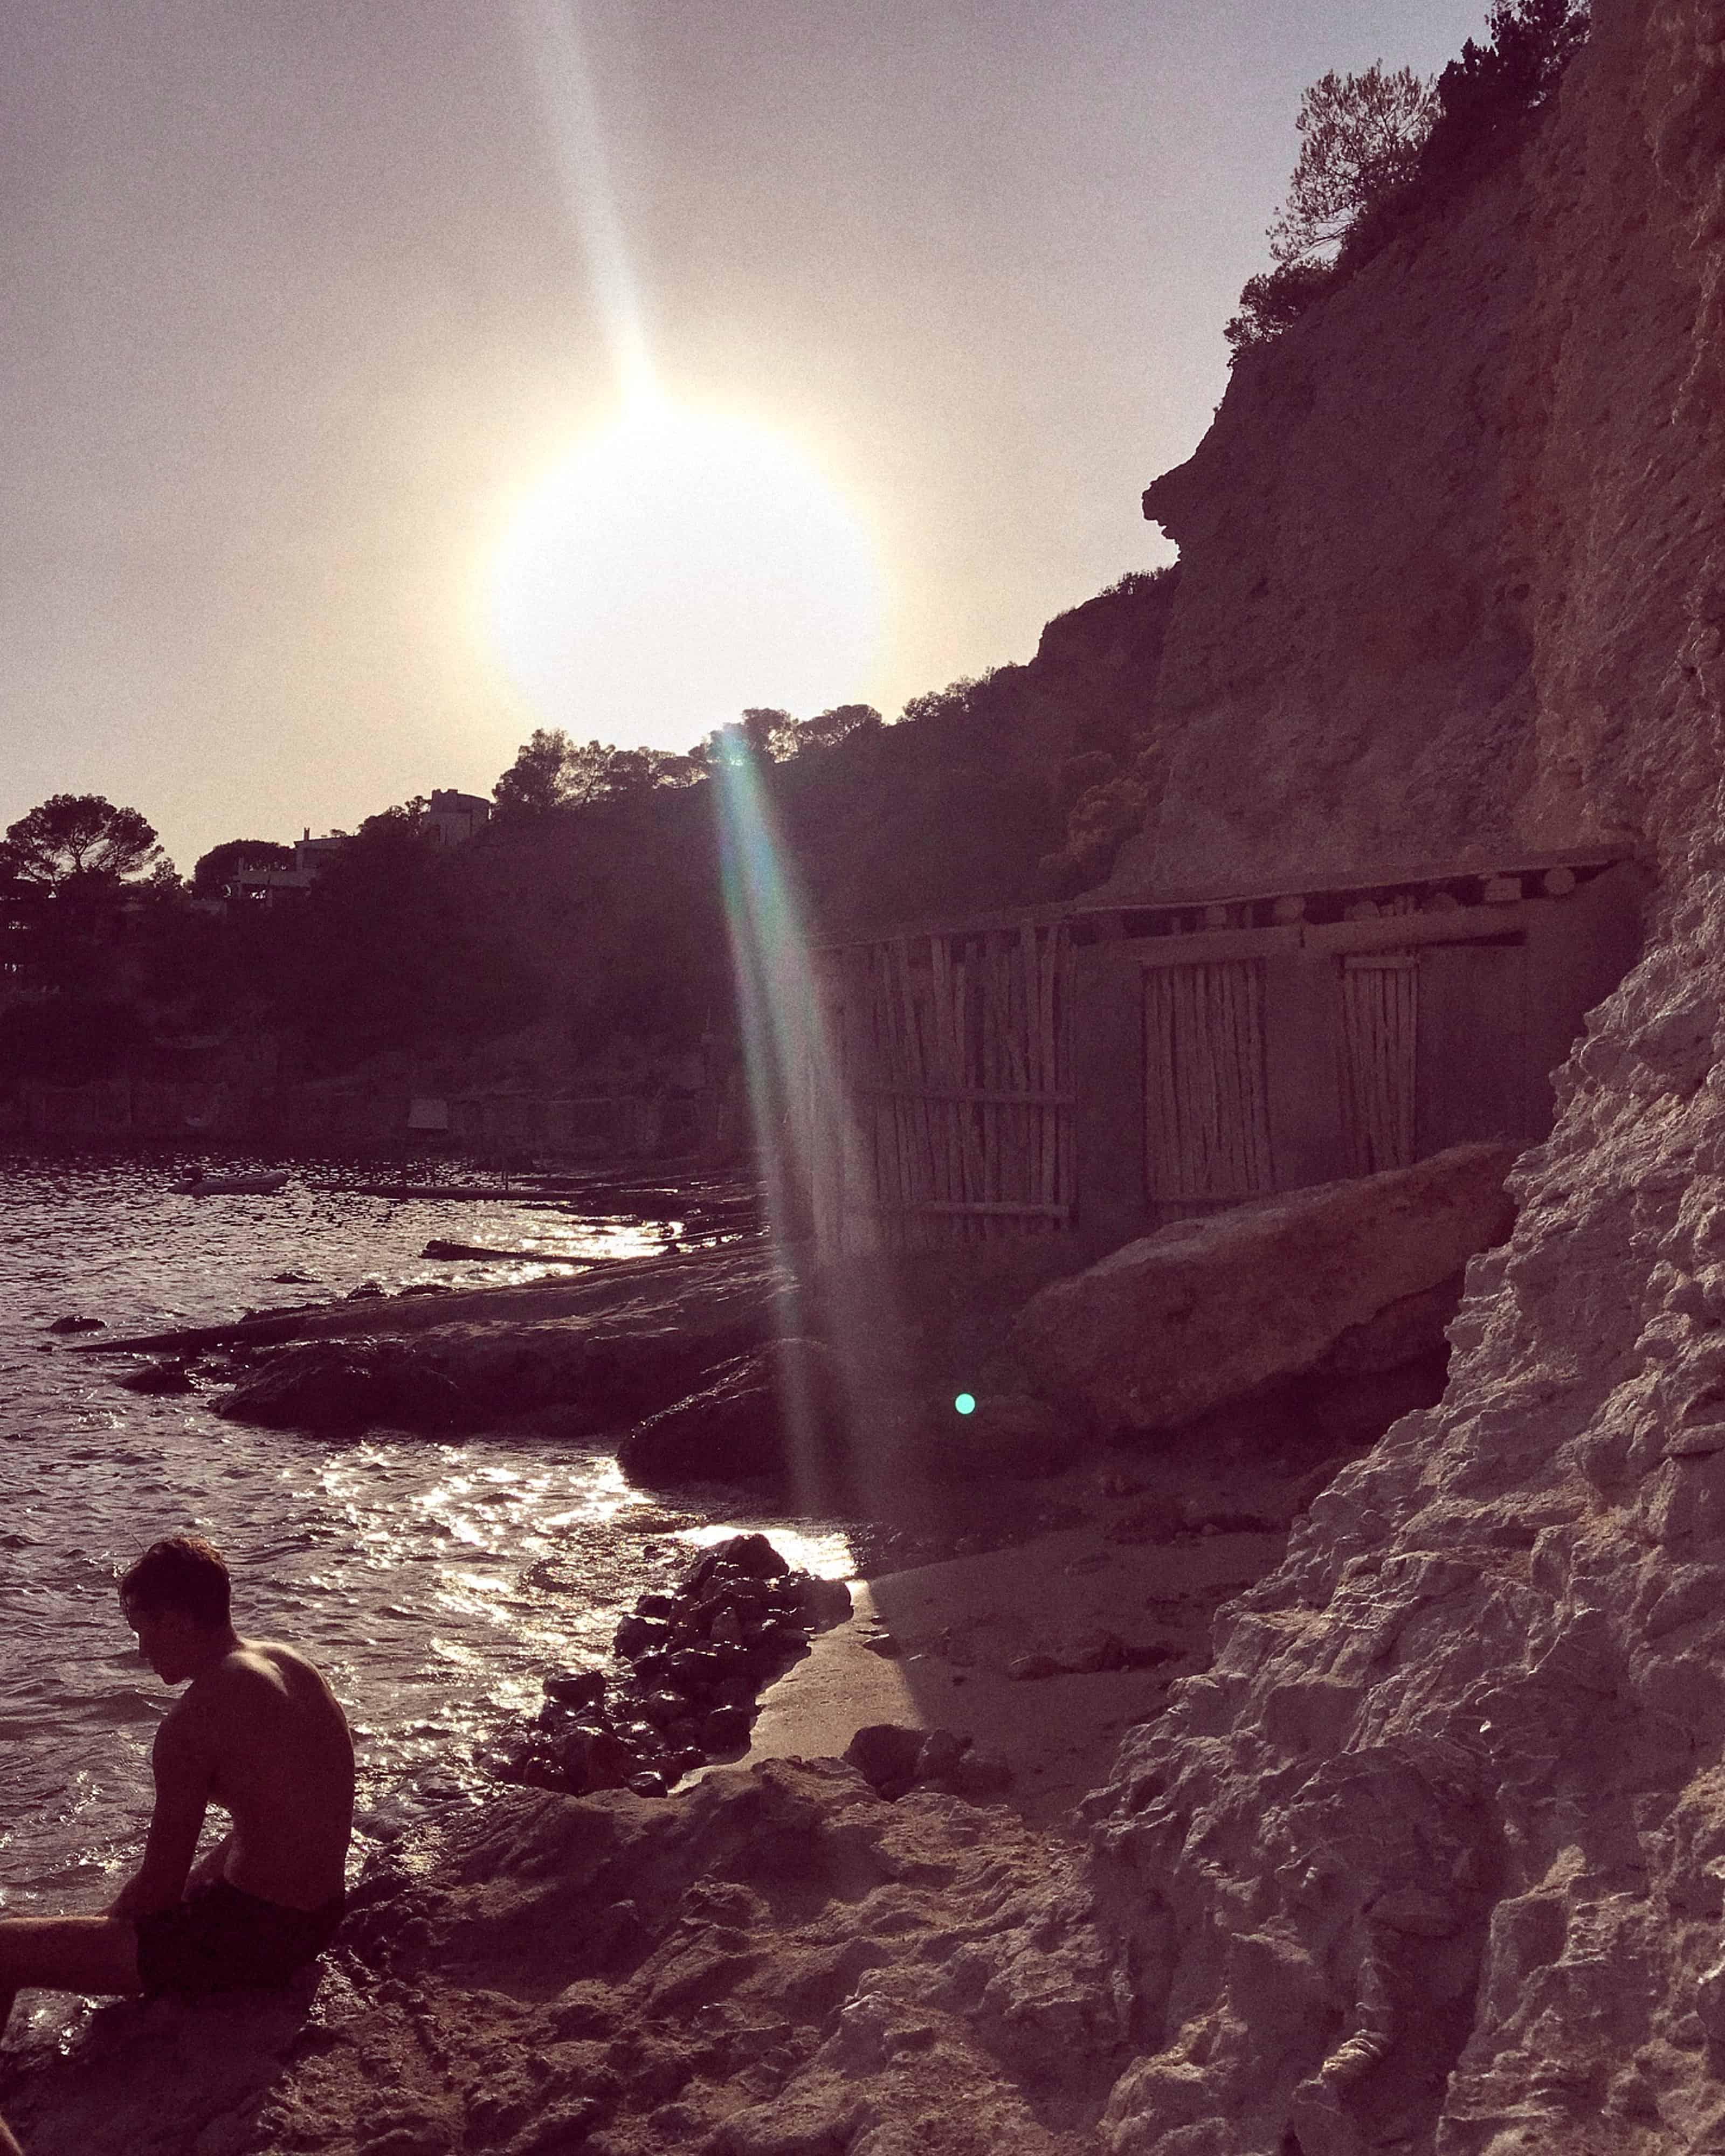 Zoe Adlersberg - summer spent in Ibiza